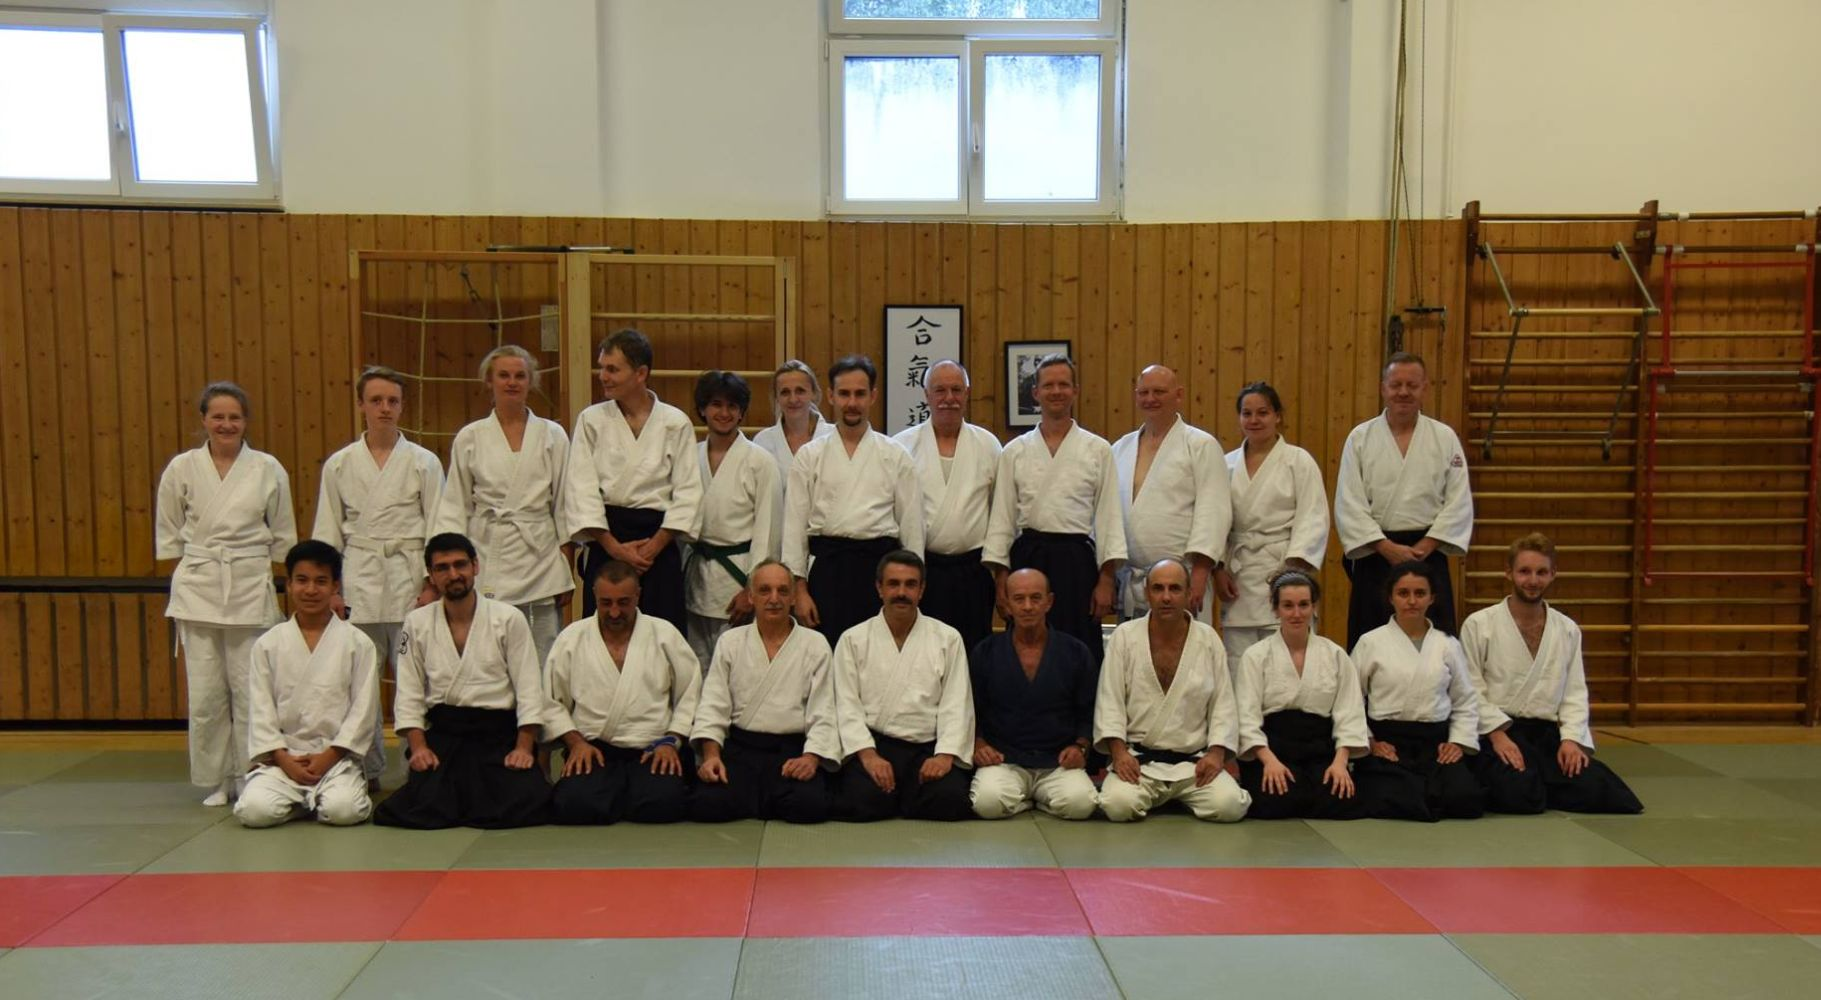 Nebi Vural Frankfurt Seminar 2018